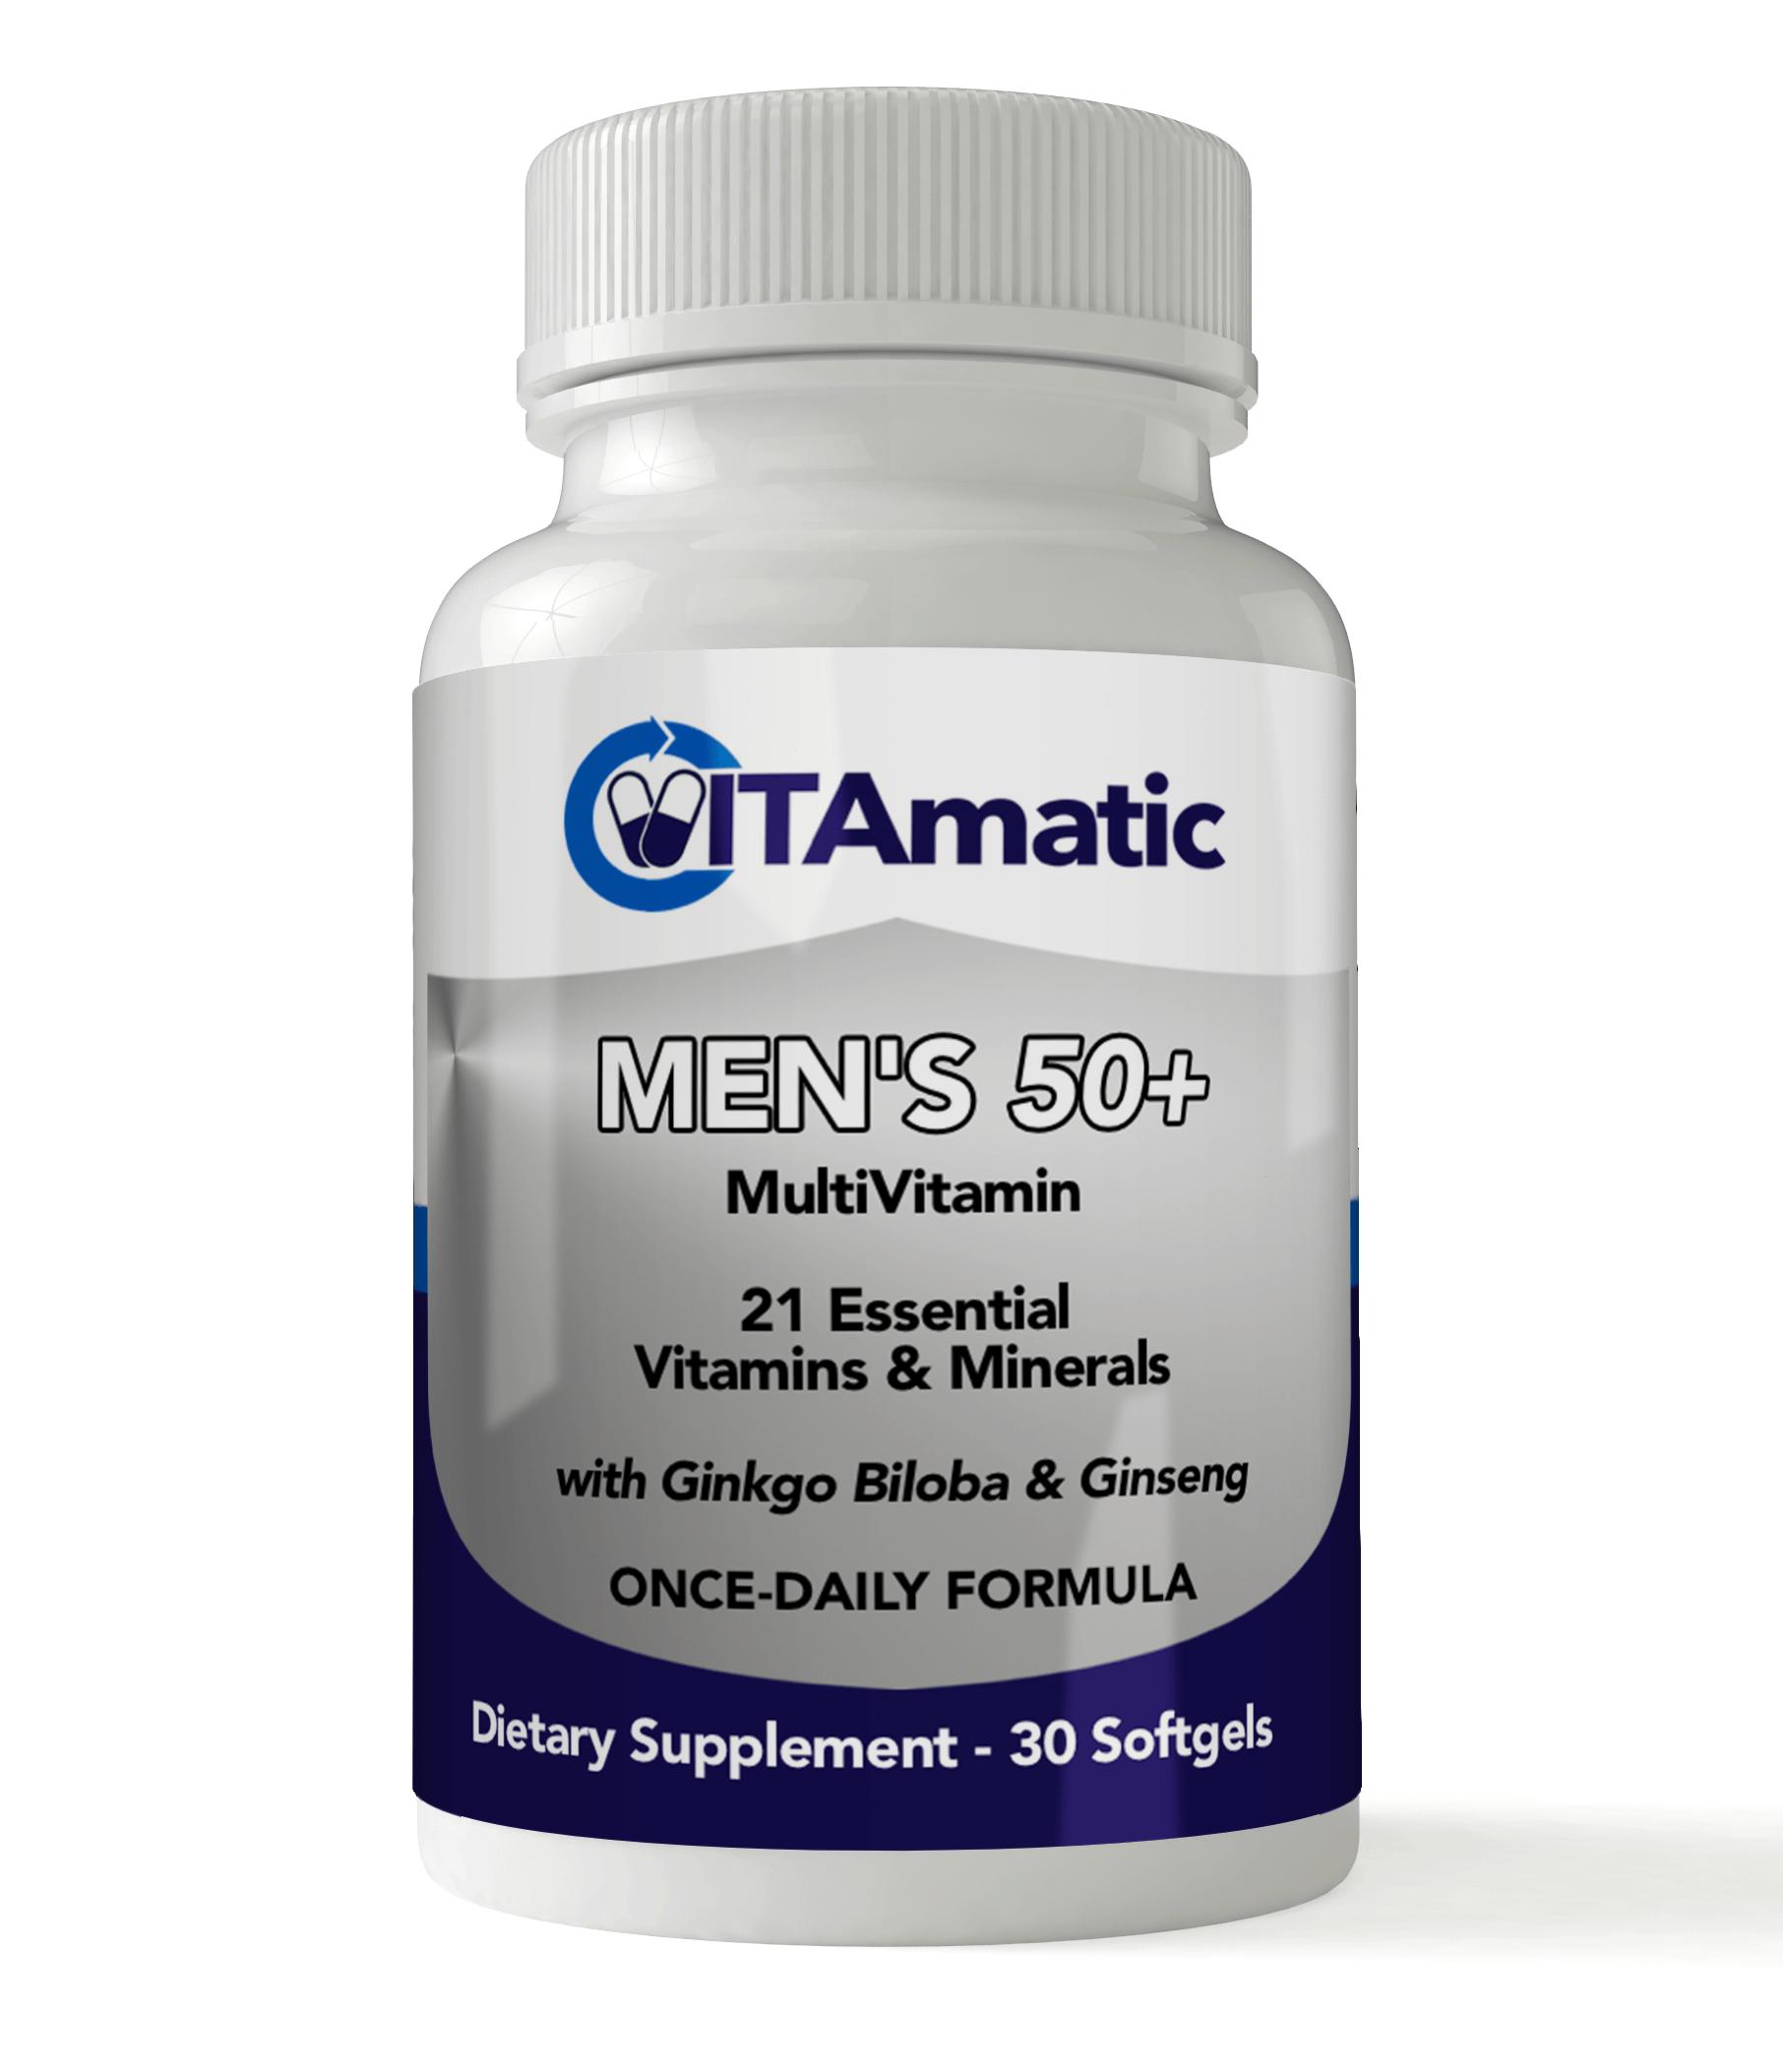 Vitamatic Mens 50+ Multivitamin